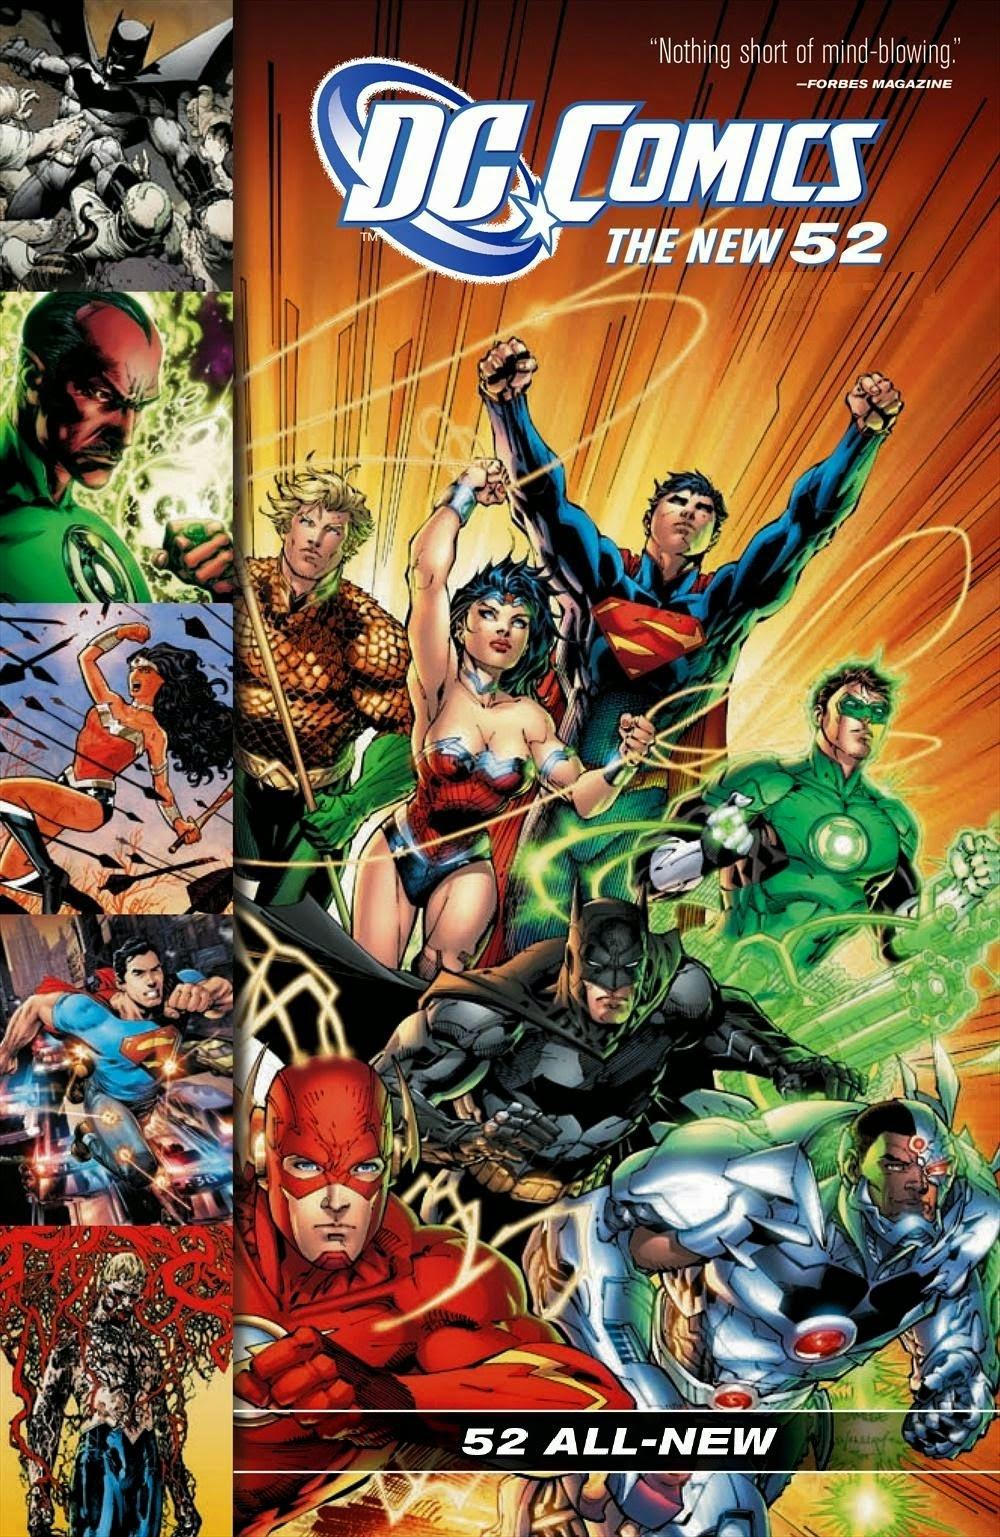 Destacados: Comics DC